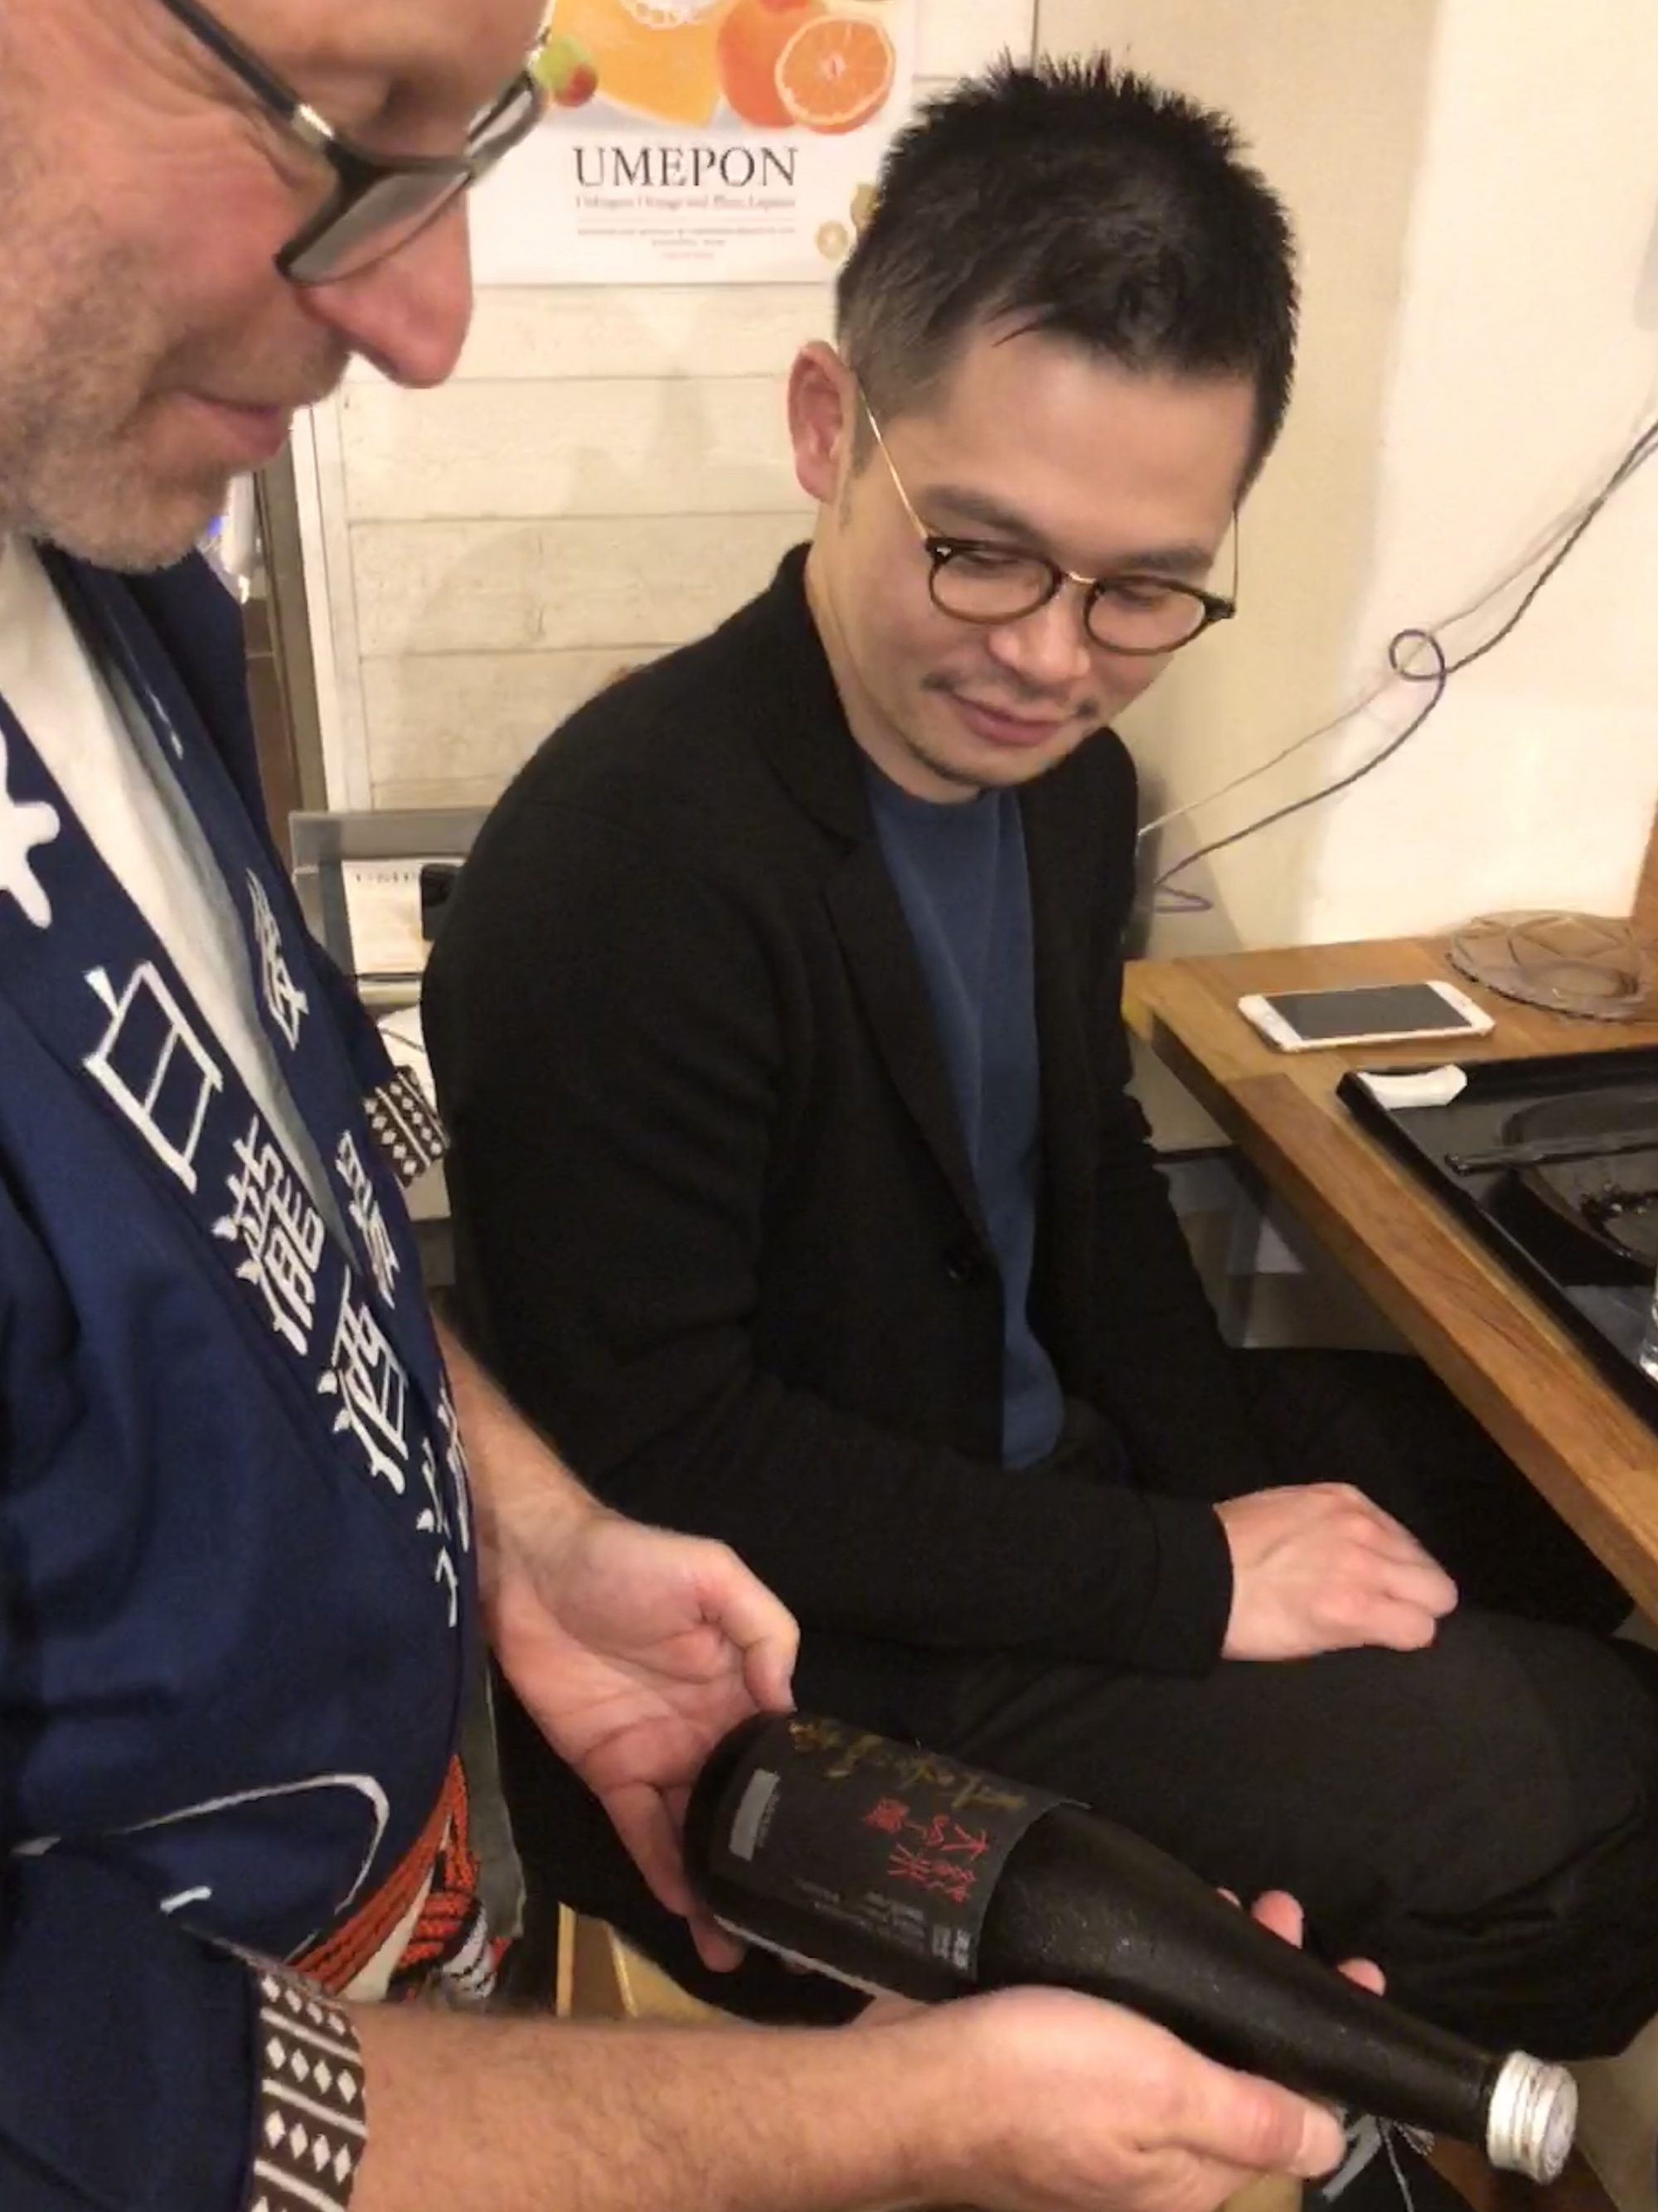 Sakéman och Sakesson - high end saké